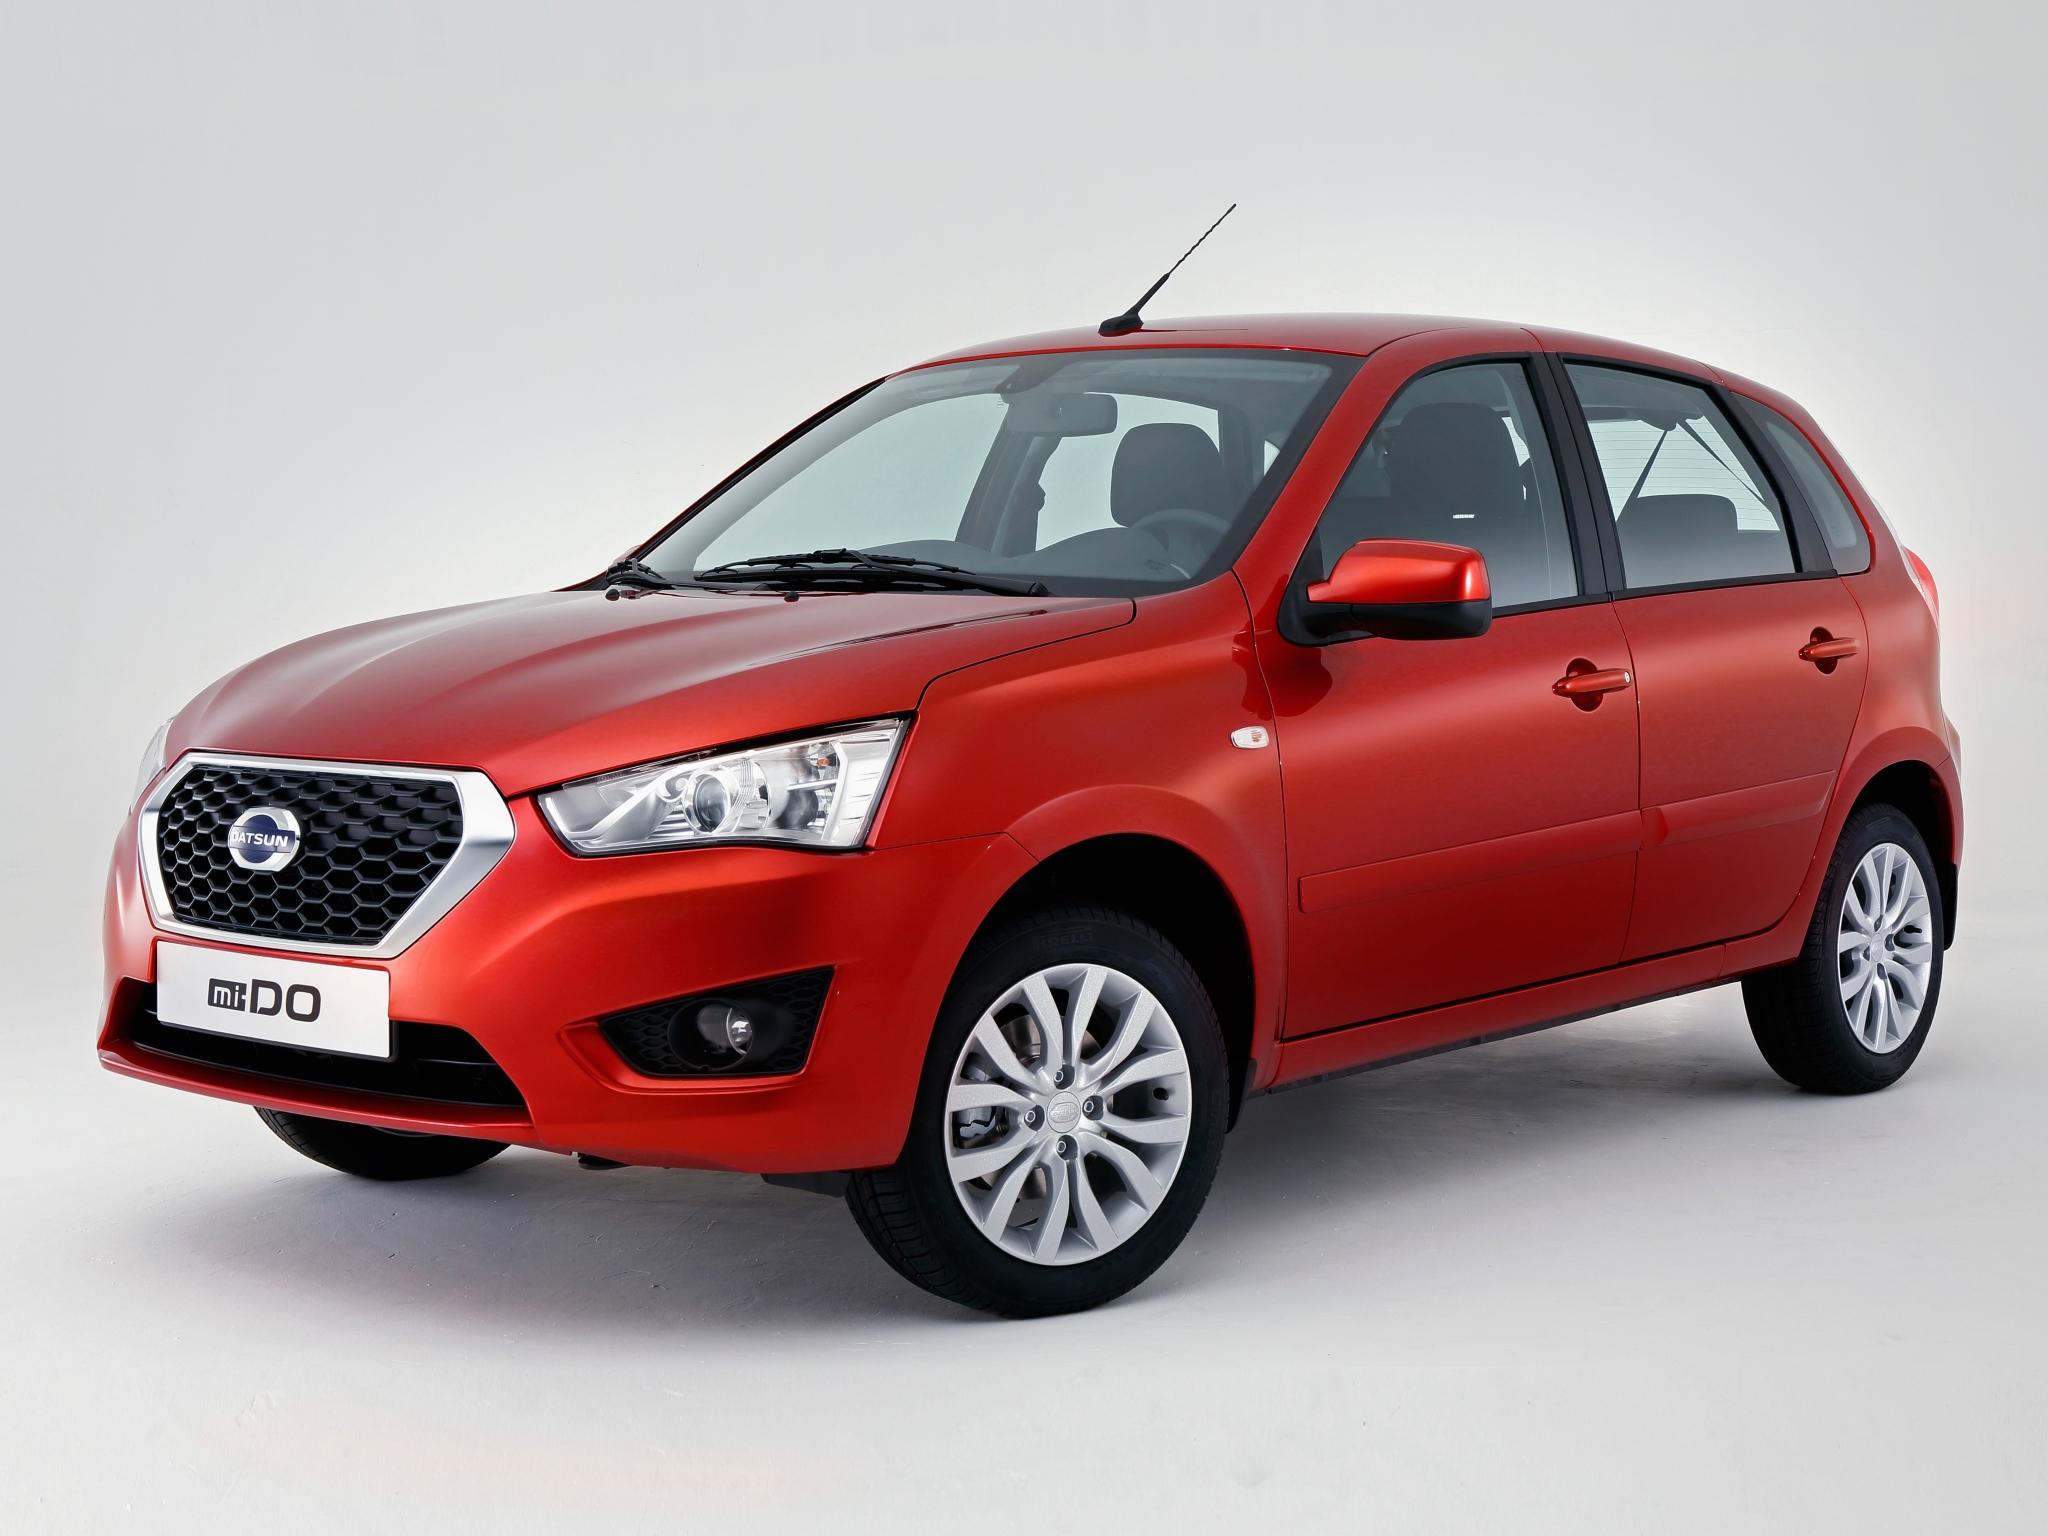 2014 - [Datsun] mi-DO - Page 2 Datsun-reveals-mi-do-hatchback-in-russia-based-on-lada-kalina-video-photo-gallery_2